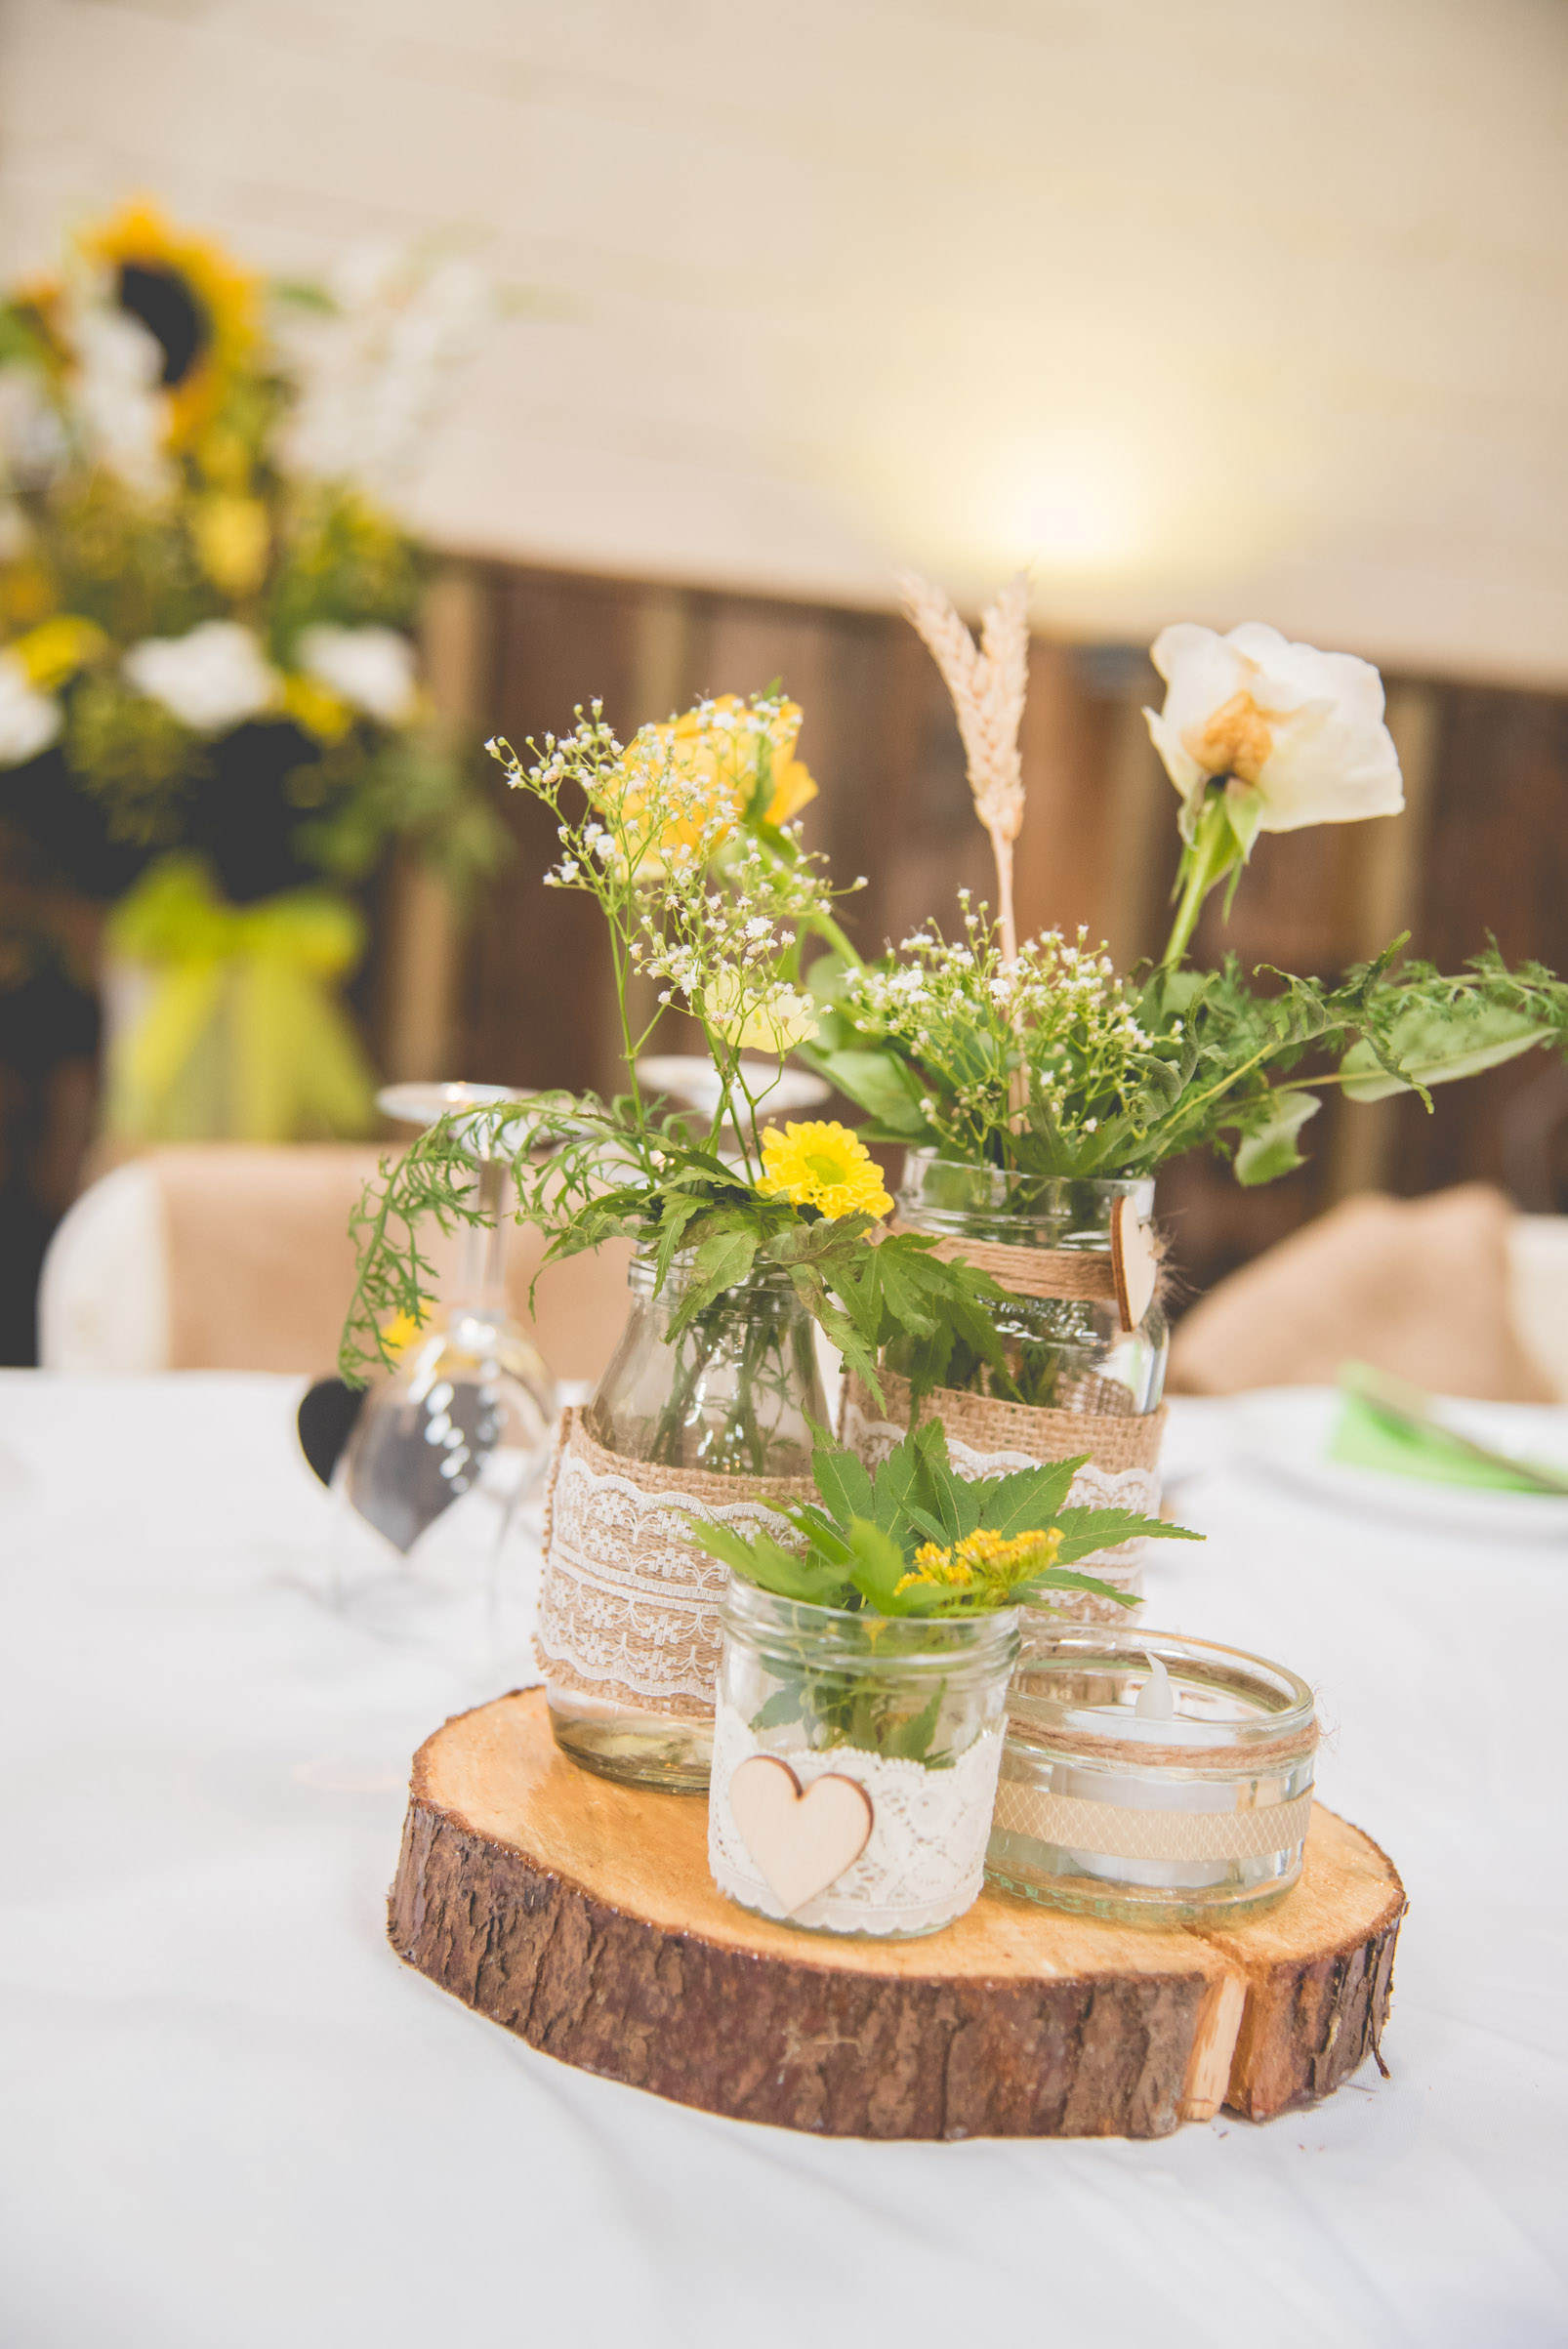 Peak+district+farm+wedding+lower+damgate+photographer-18.jpg